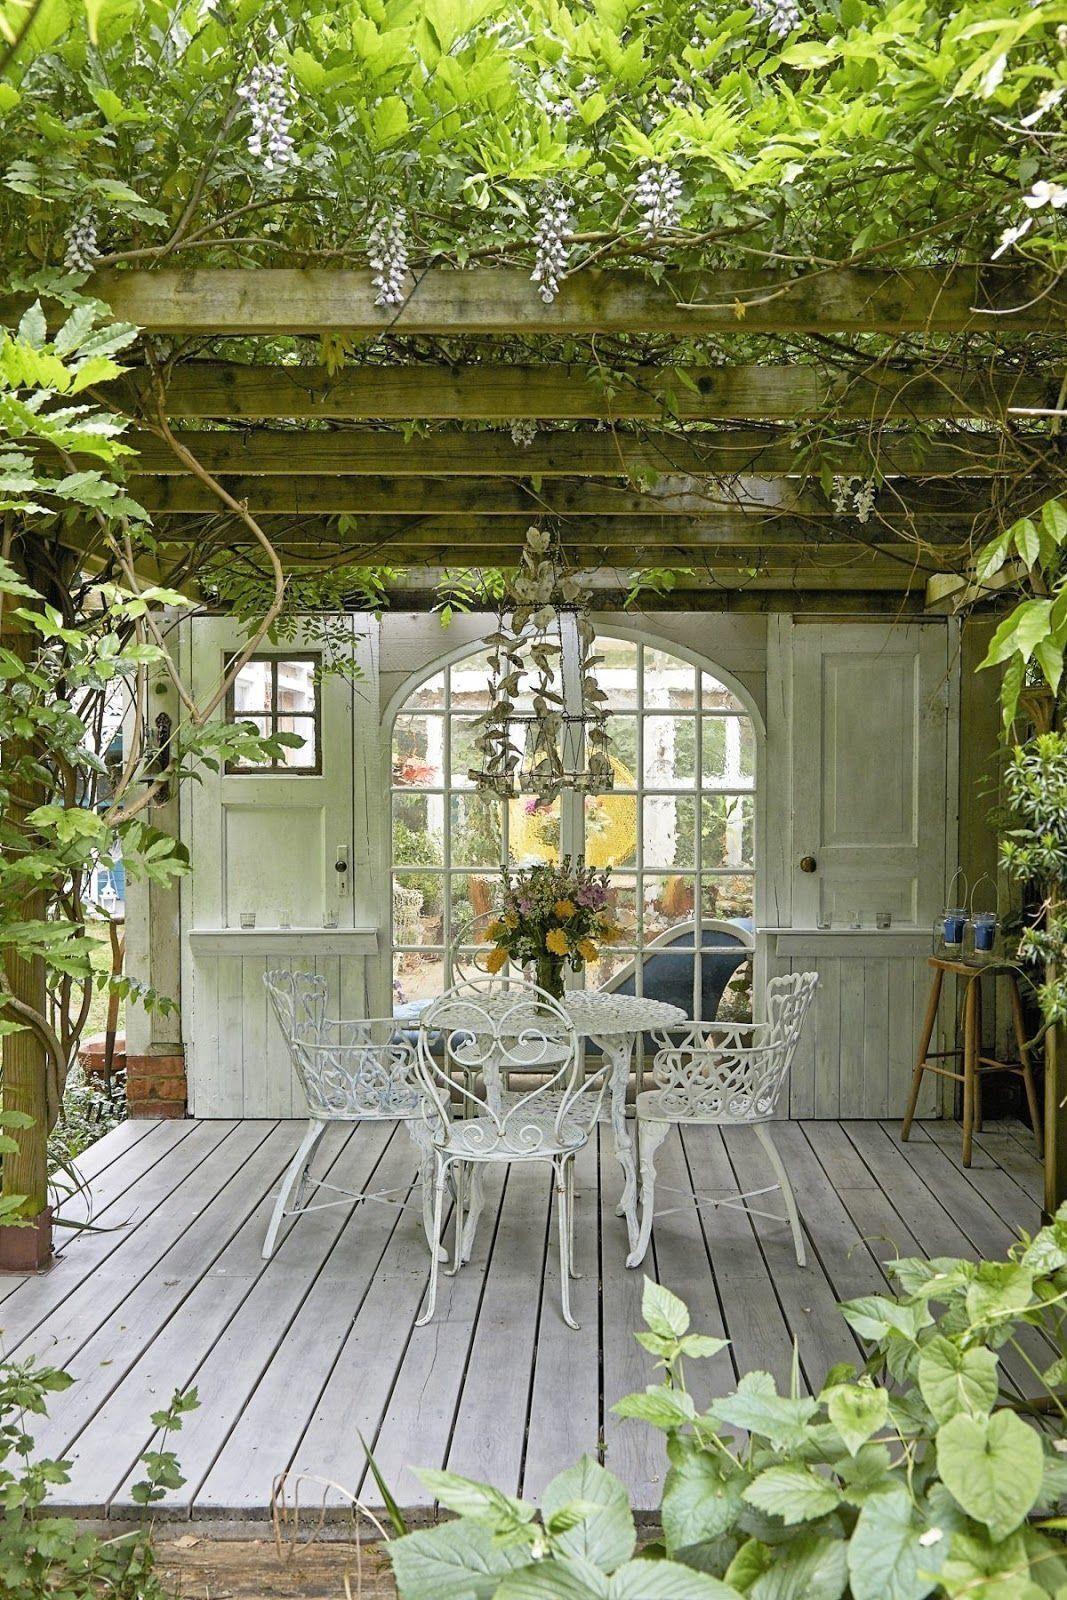 Rustikal Vintage Shabby Charm 2 Dezember 2018 Zsazsa Bellagio Wie Kein An Modern Design Gartengestaltung Gartengestaltung Ideen Gartenhaus